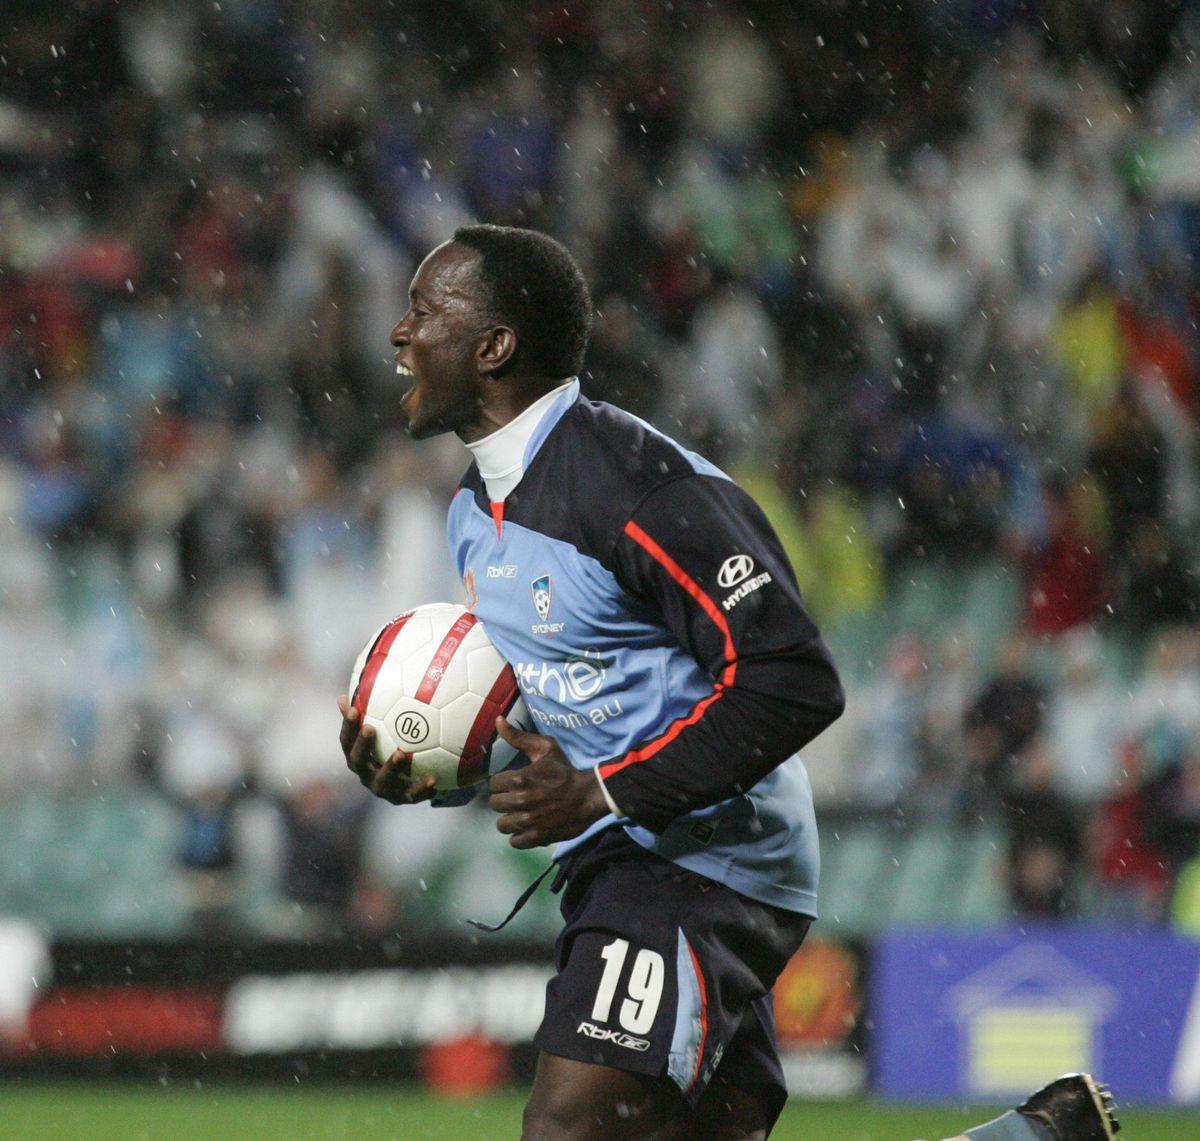 Sydney FC V Central Coast's Dwight Yorke scores for Sydney's second goal, 16 Sep